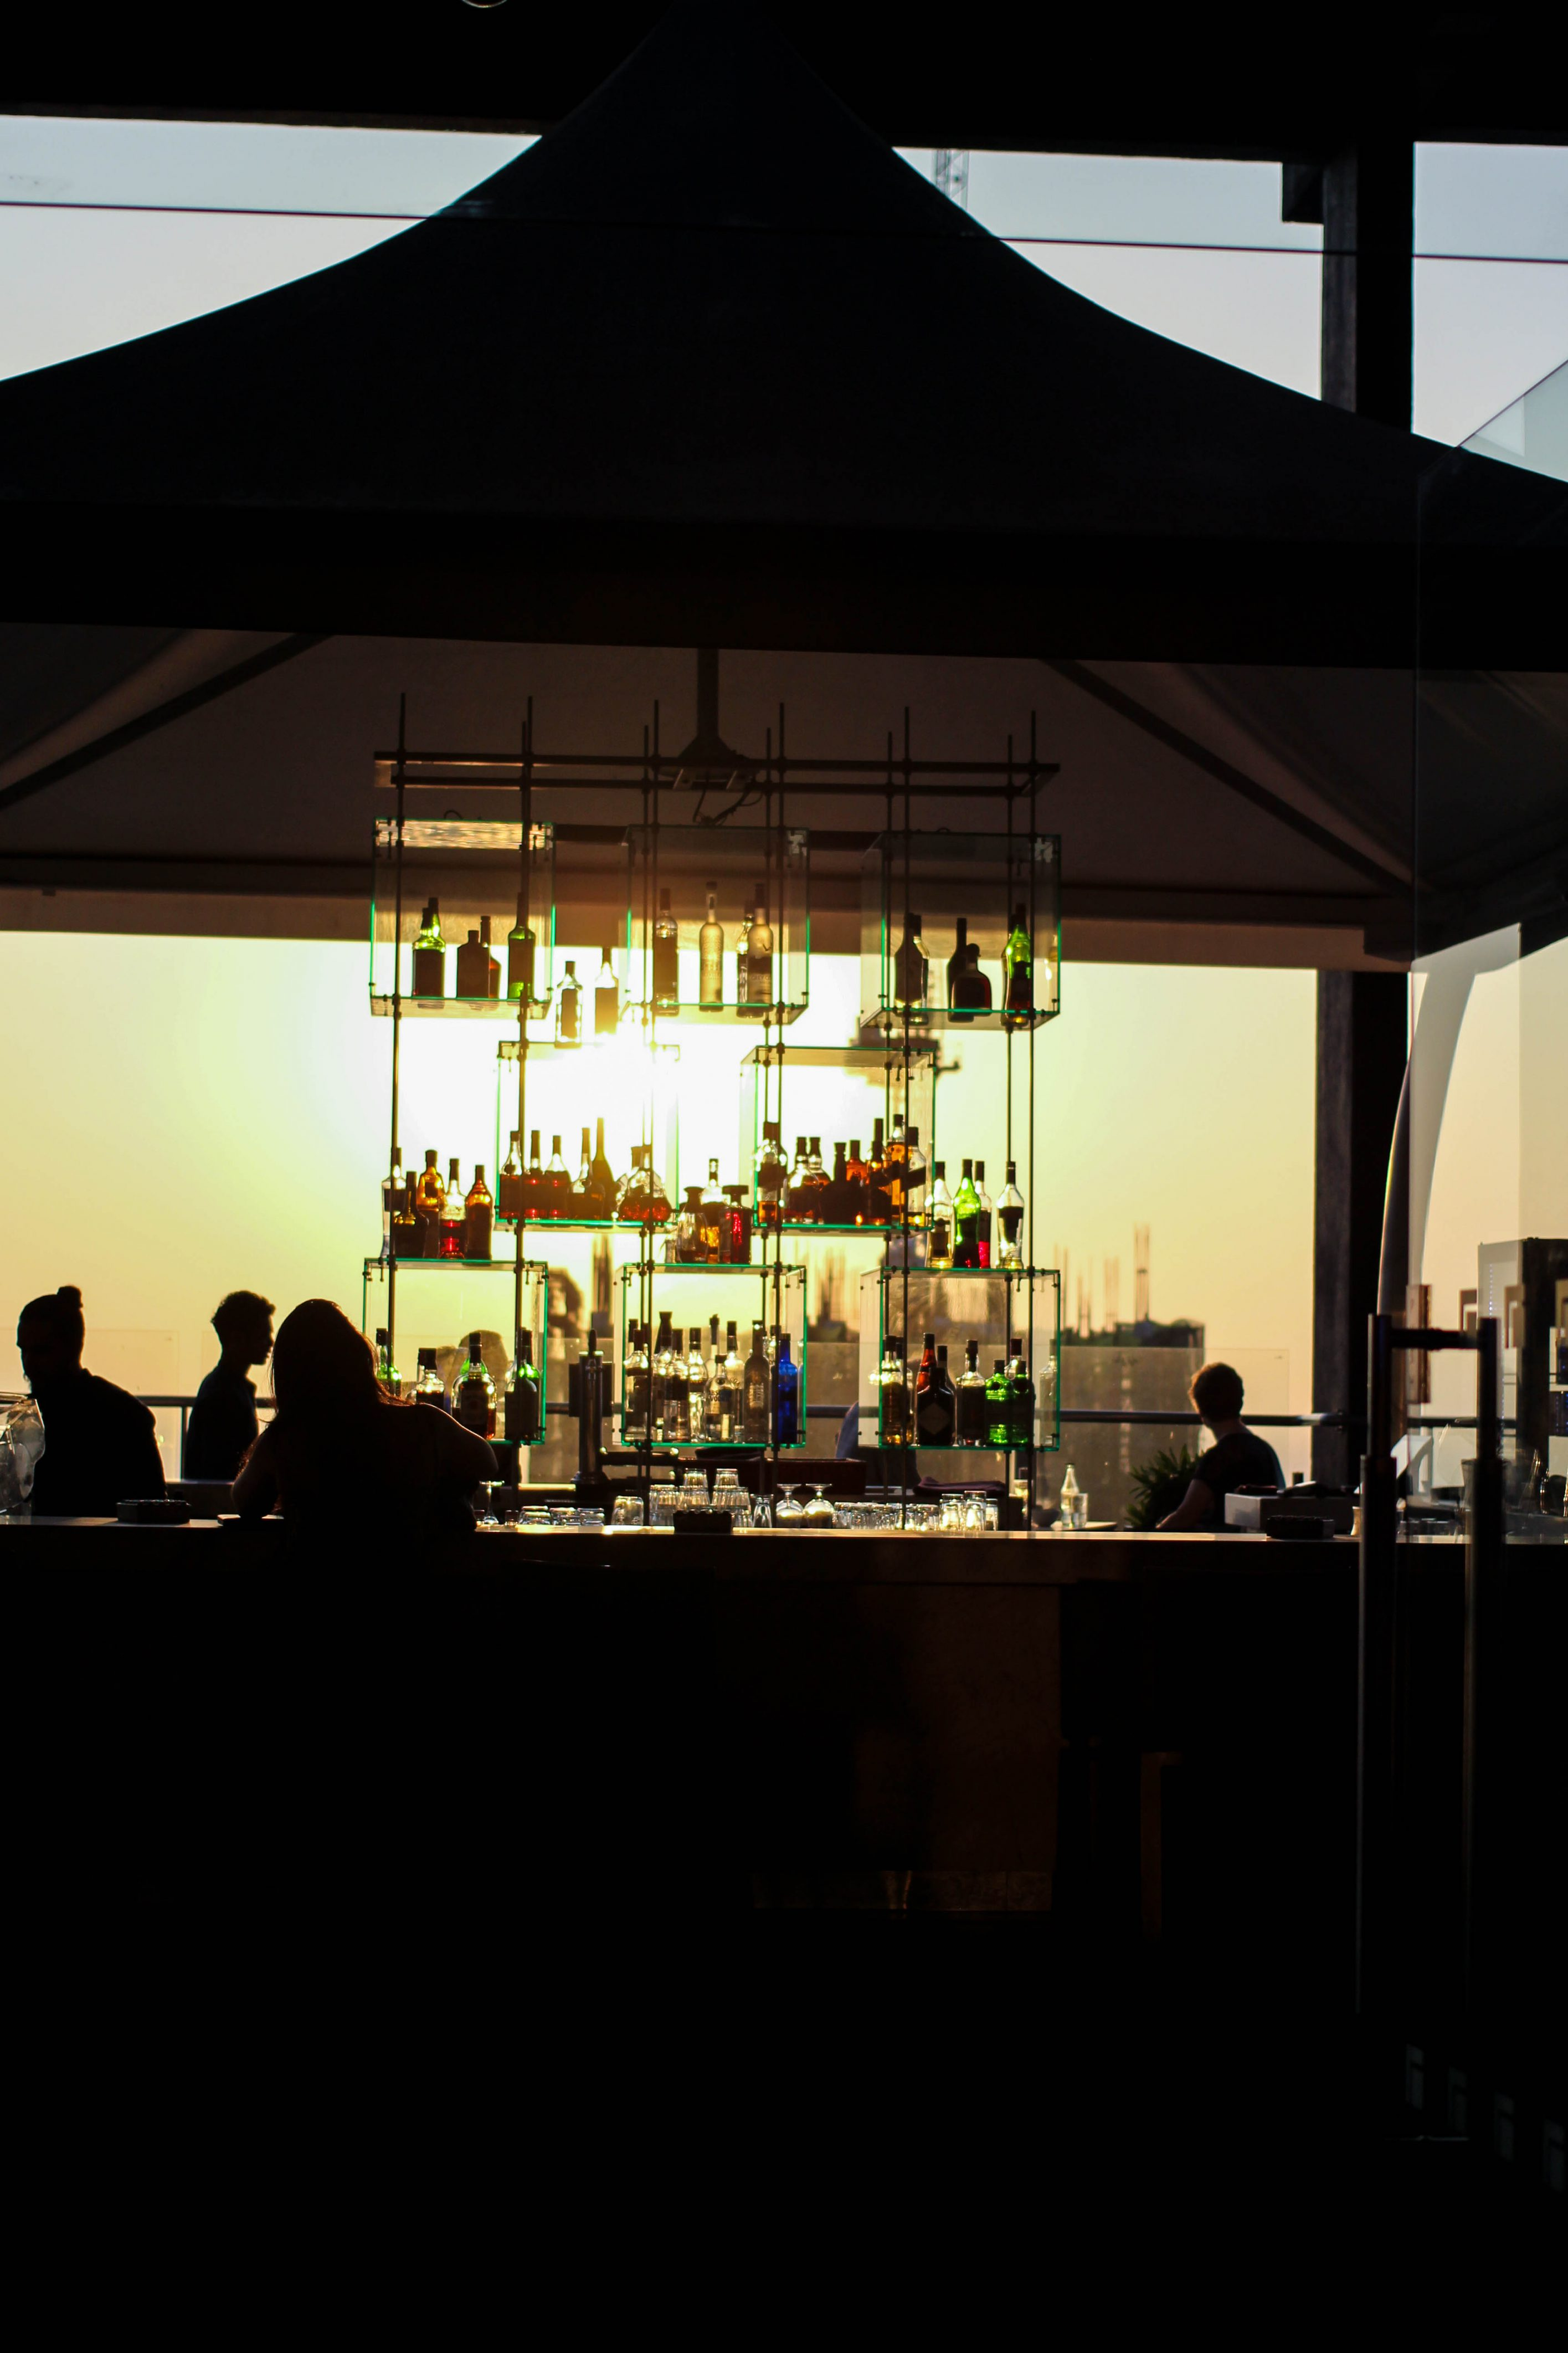 Rooftop Bar Colombo Skyline Mövenpick Colombo Hotel Reiseblog Brinisfashionbook bestes Hotel Sri Lanka